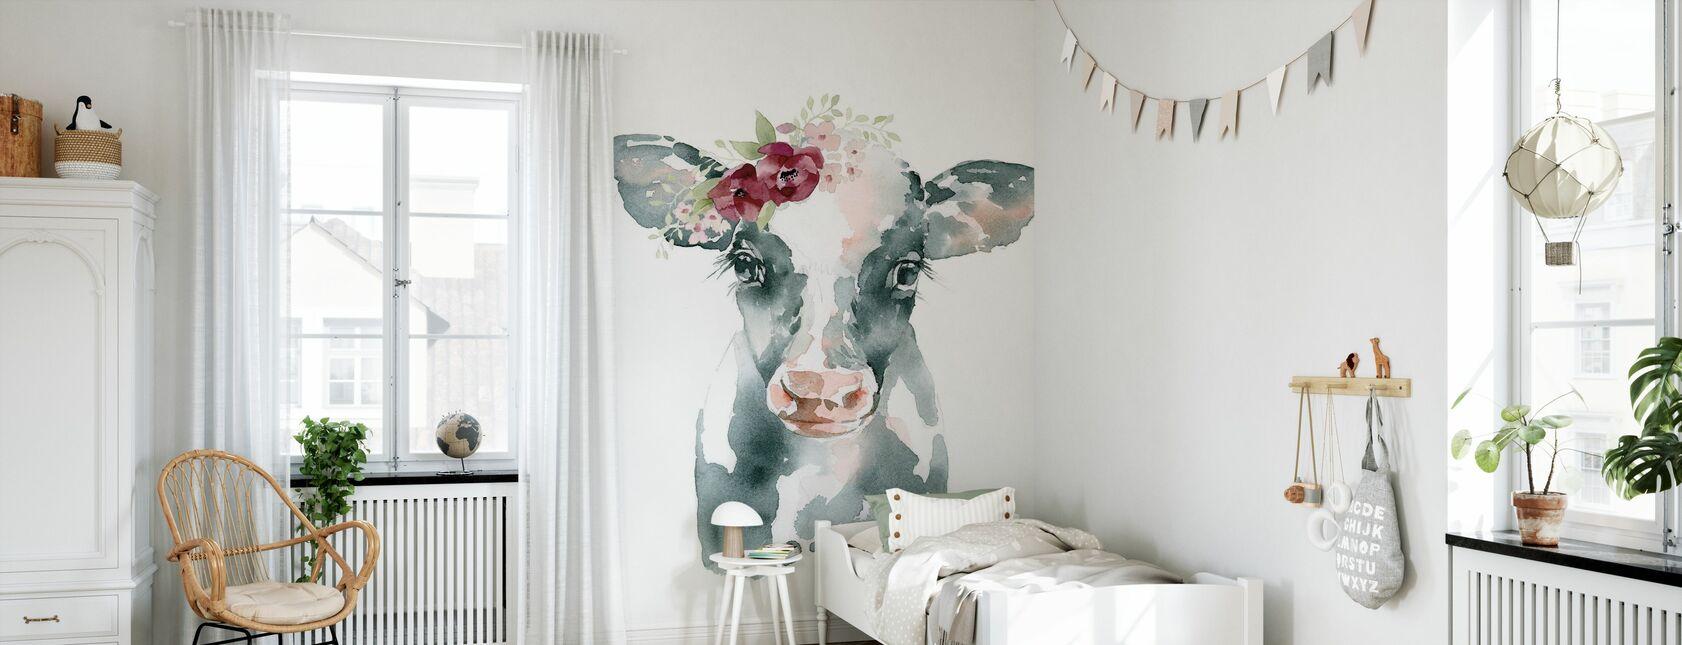 Floral Cow - Wallpaper - Kids Room